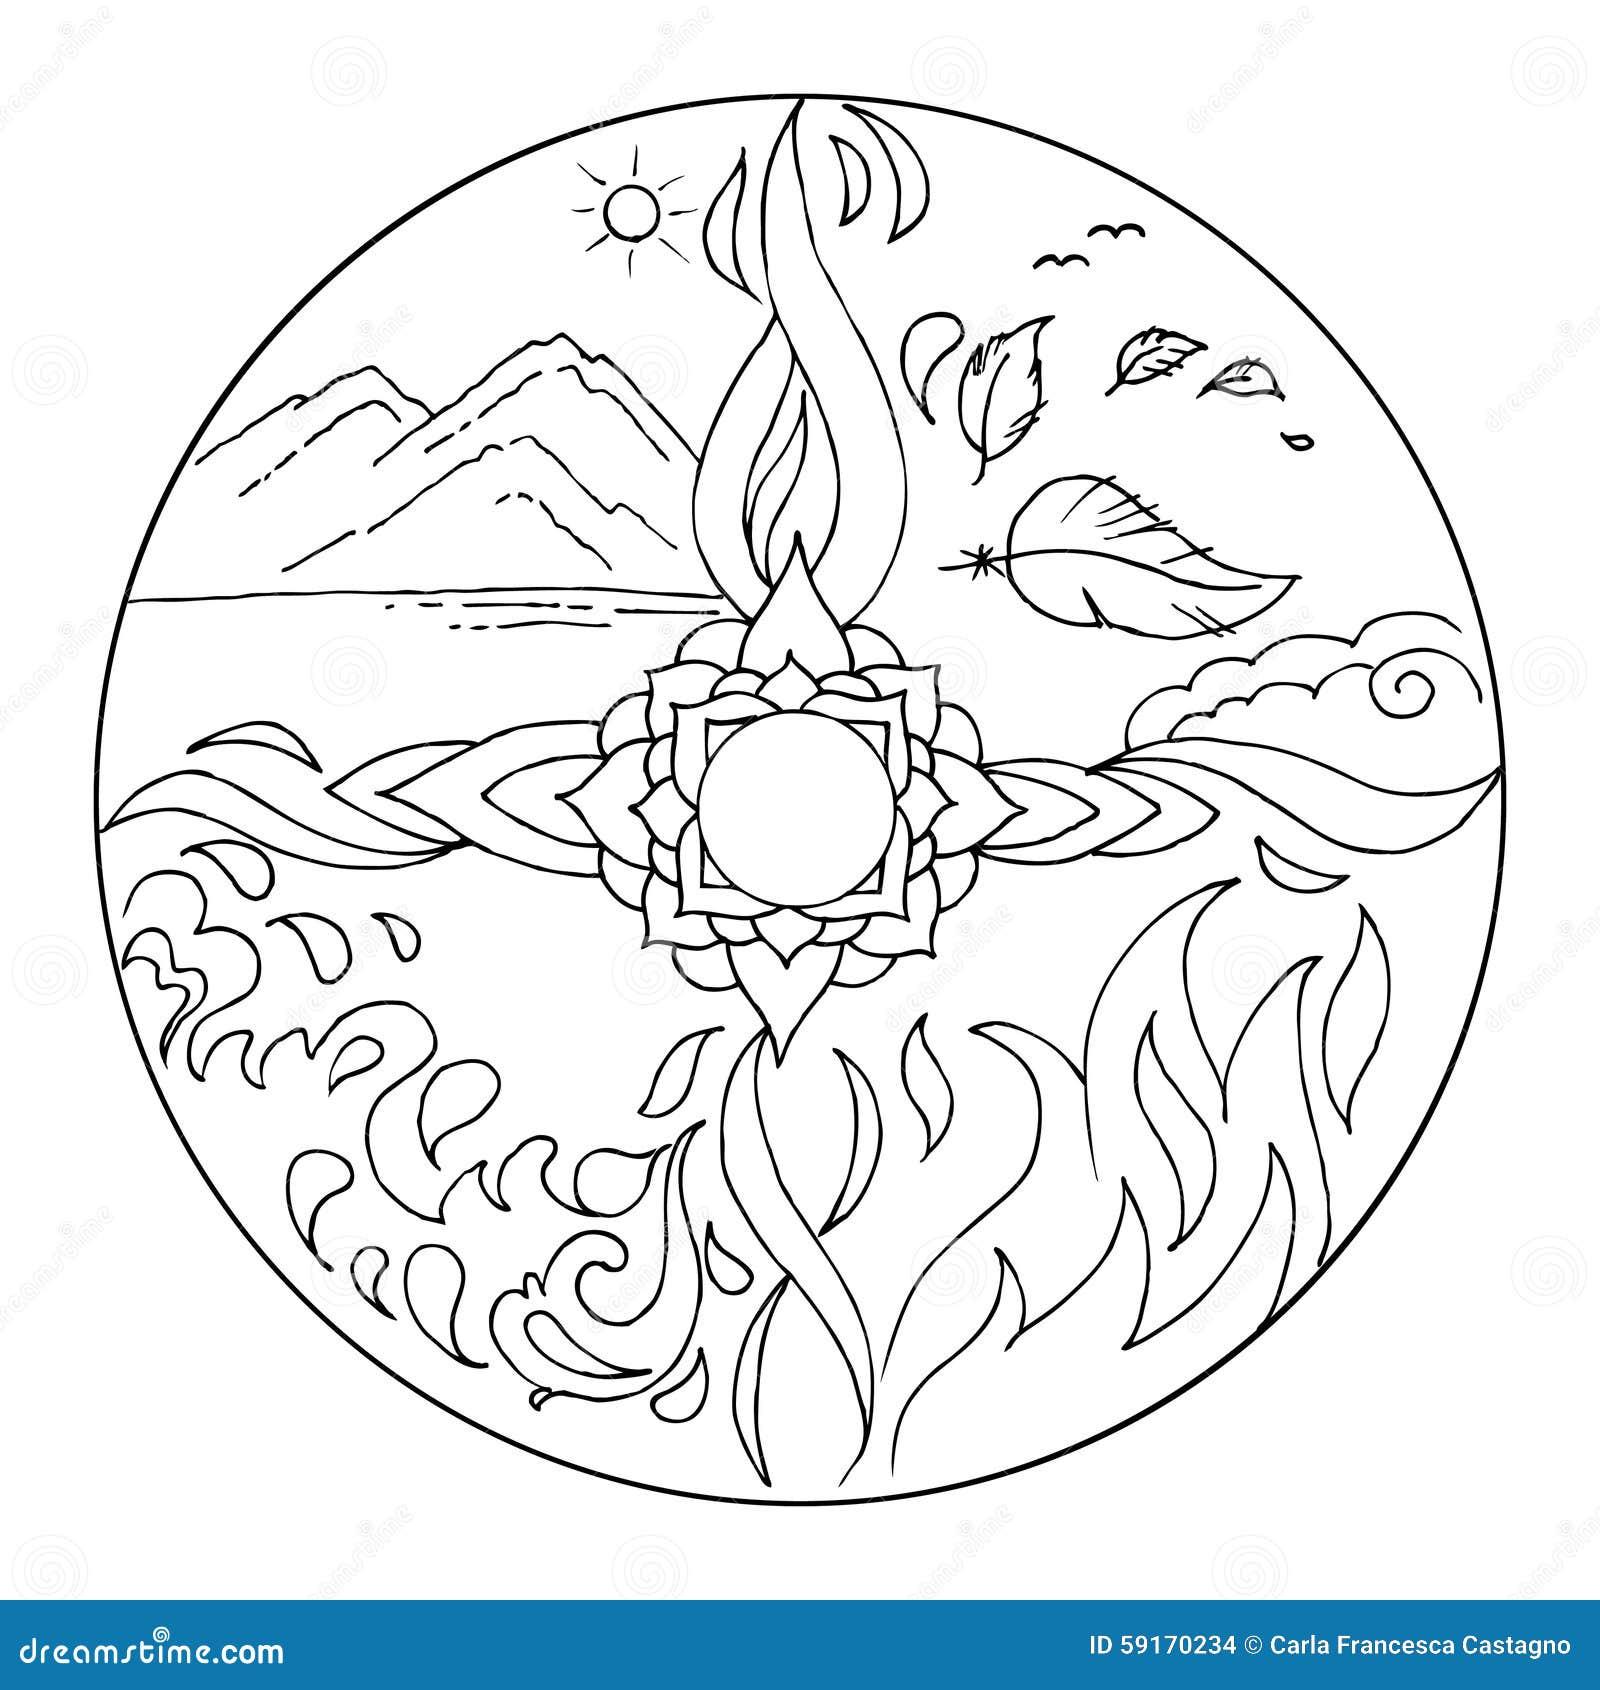 Färbung Von 4 Elementen Mandala Diksha Vektor Abbildung ...